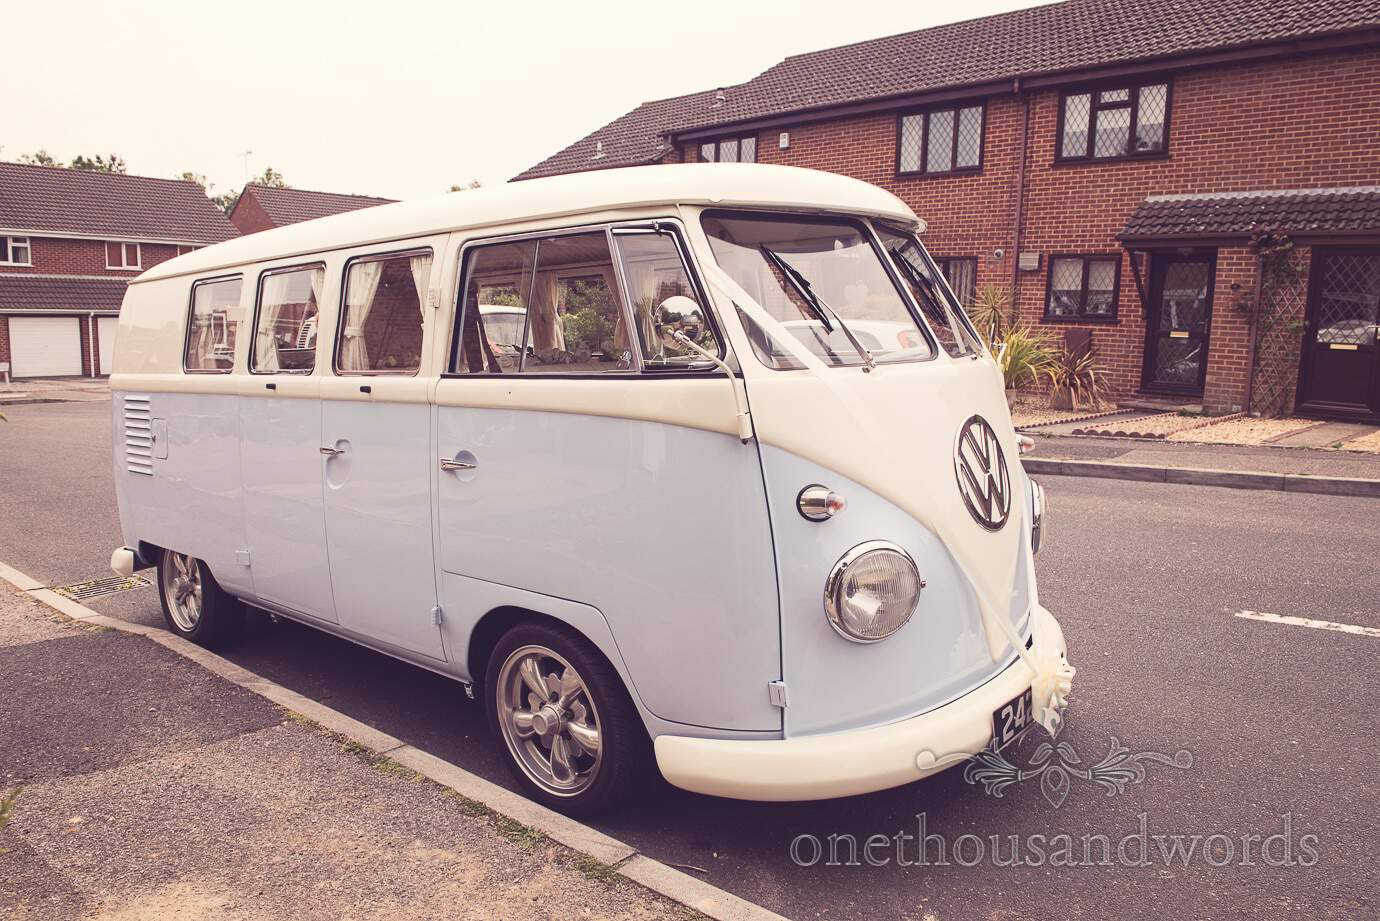 Blue split screen wedding VW campervan from Dorset Dub Hire